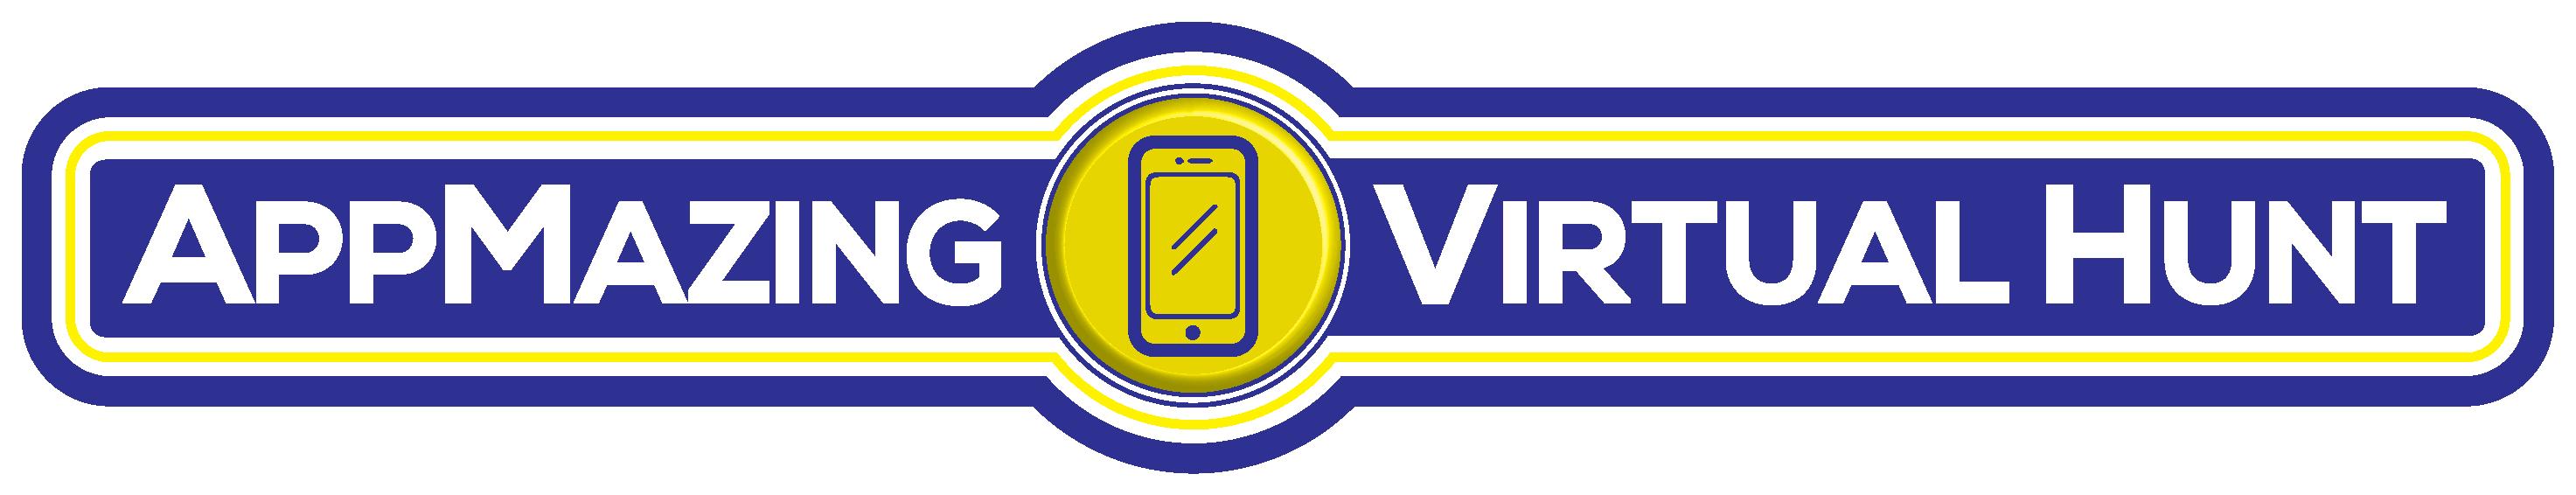 AppMazing Virtual Hunt-2